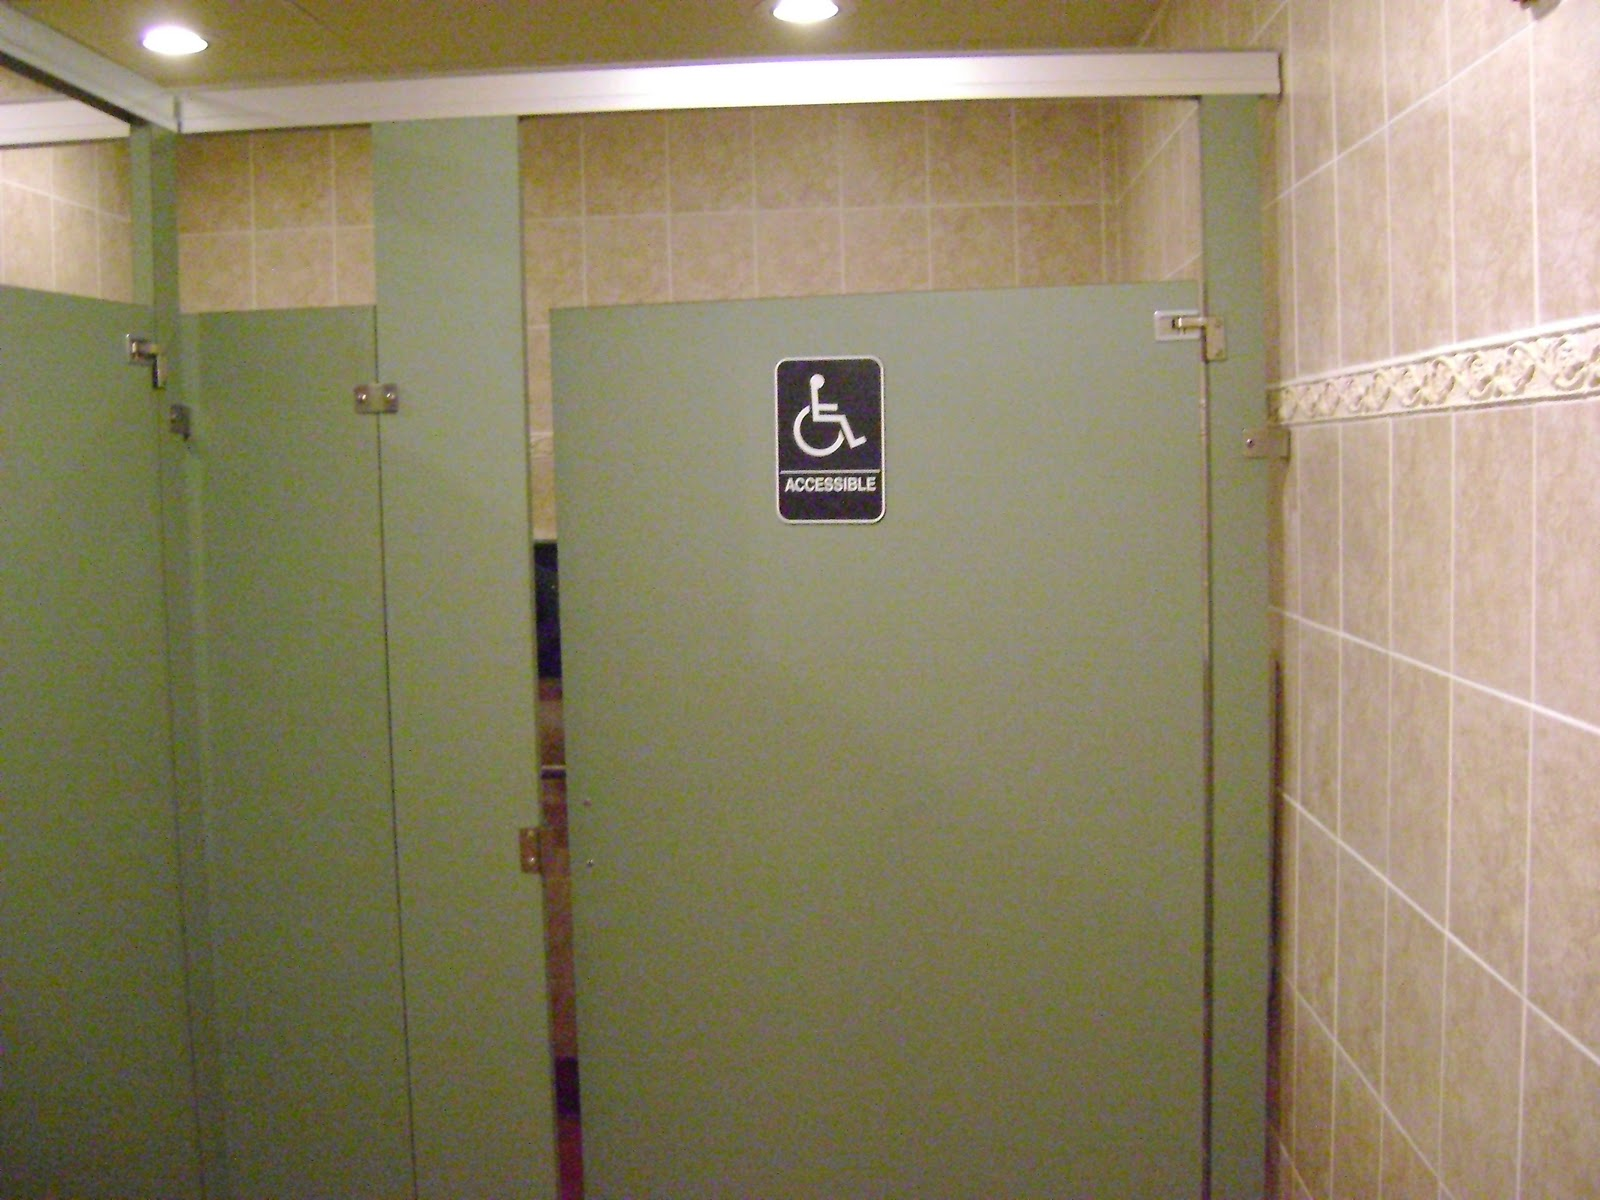 Captivating 60 Handicap Bathroom Stall Design Inspiration Of Can